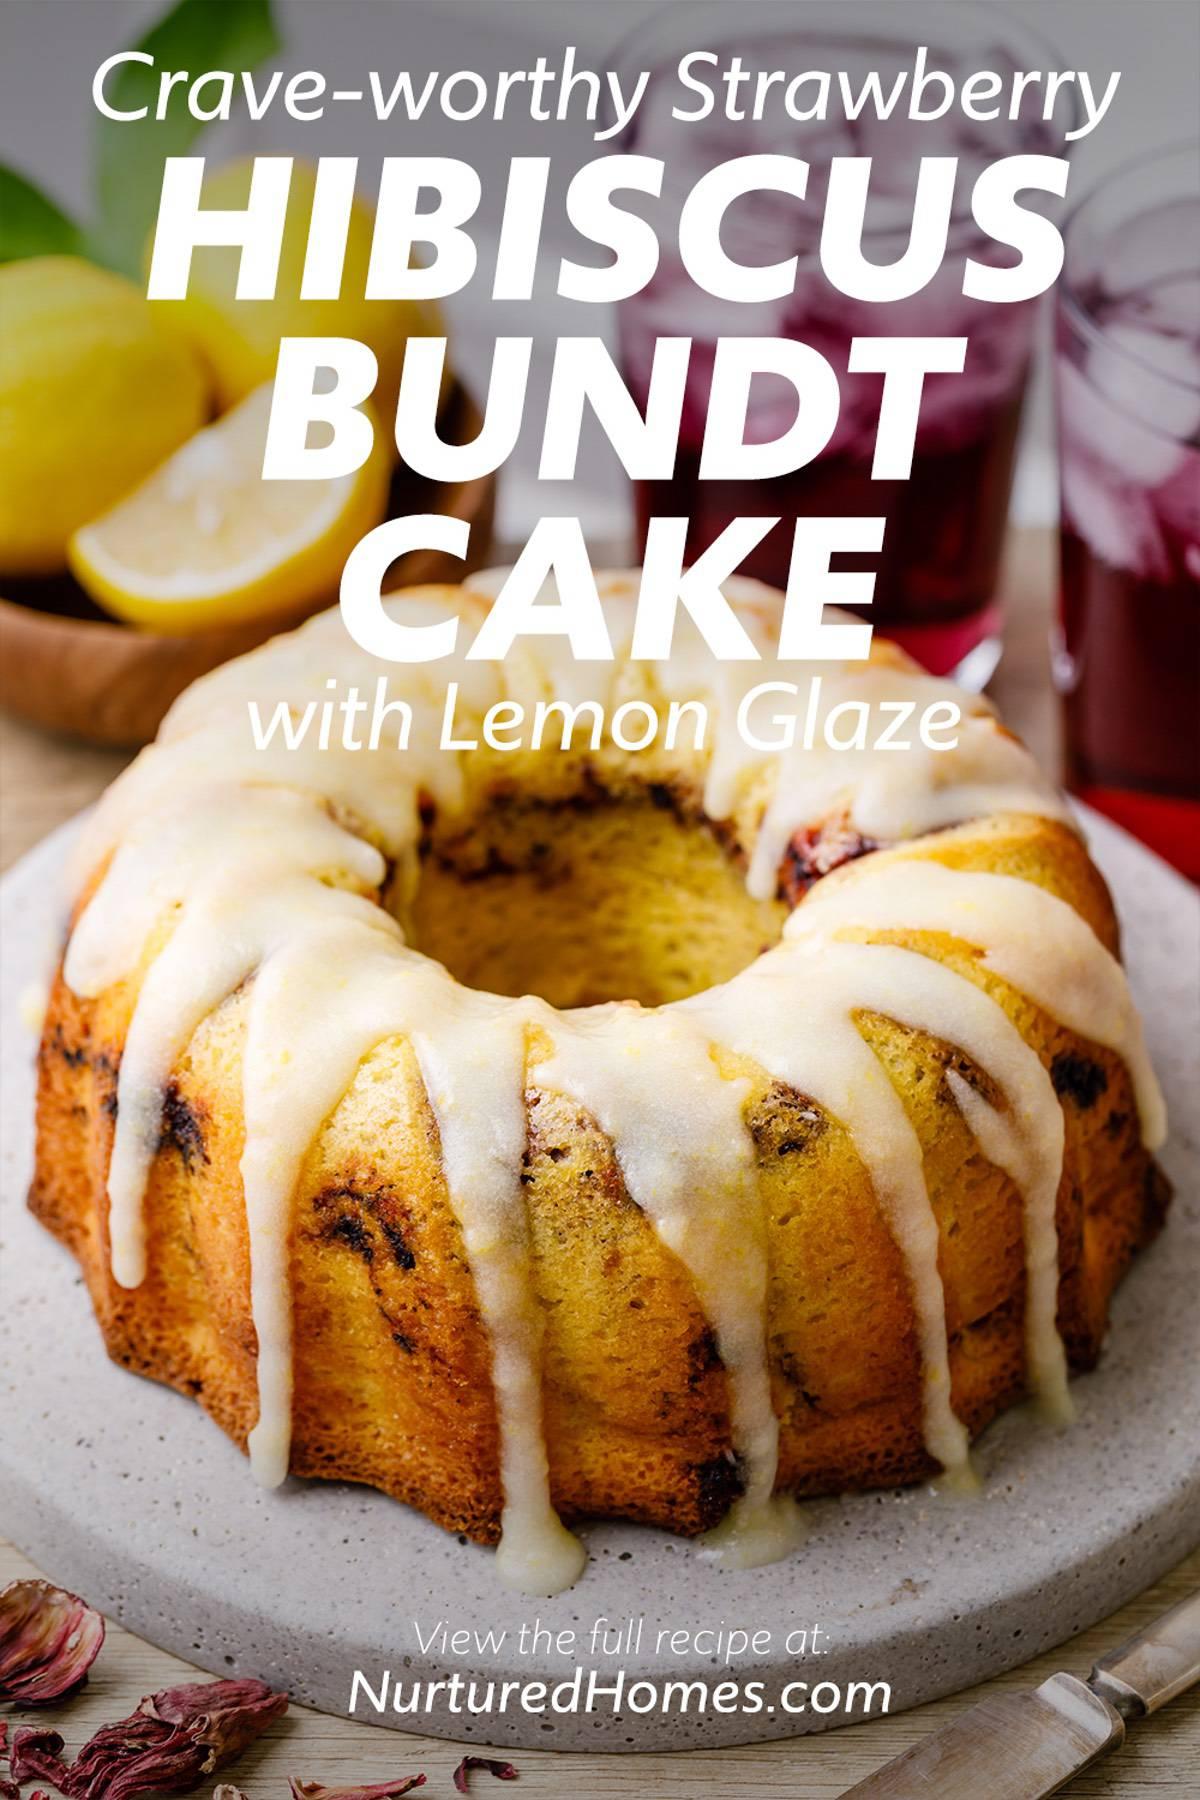 Strawberry Hibiscus Bundt Cake with Lemon Glaze